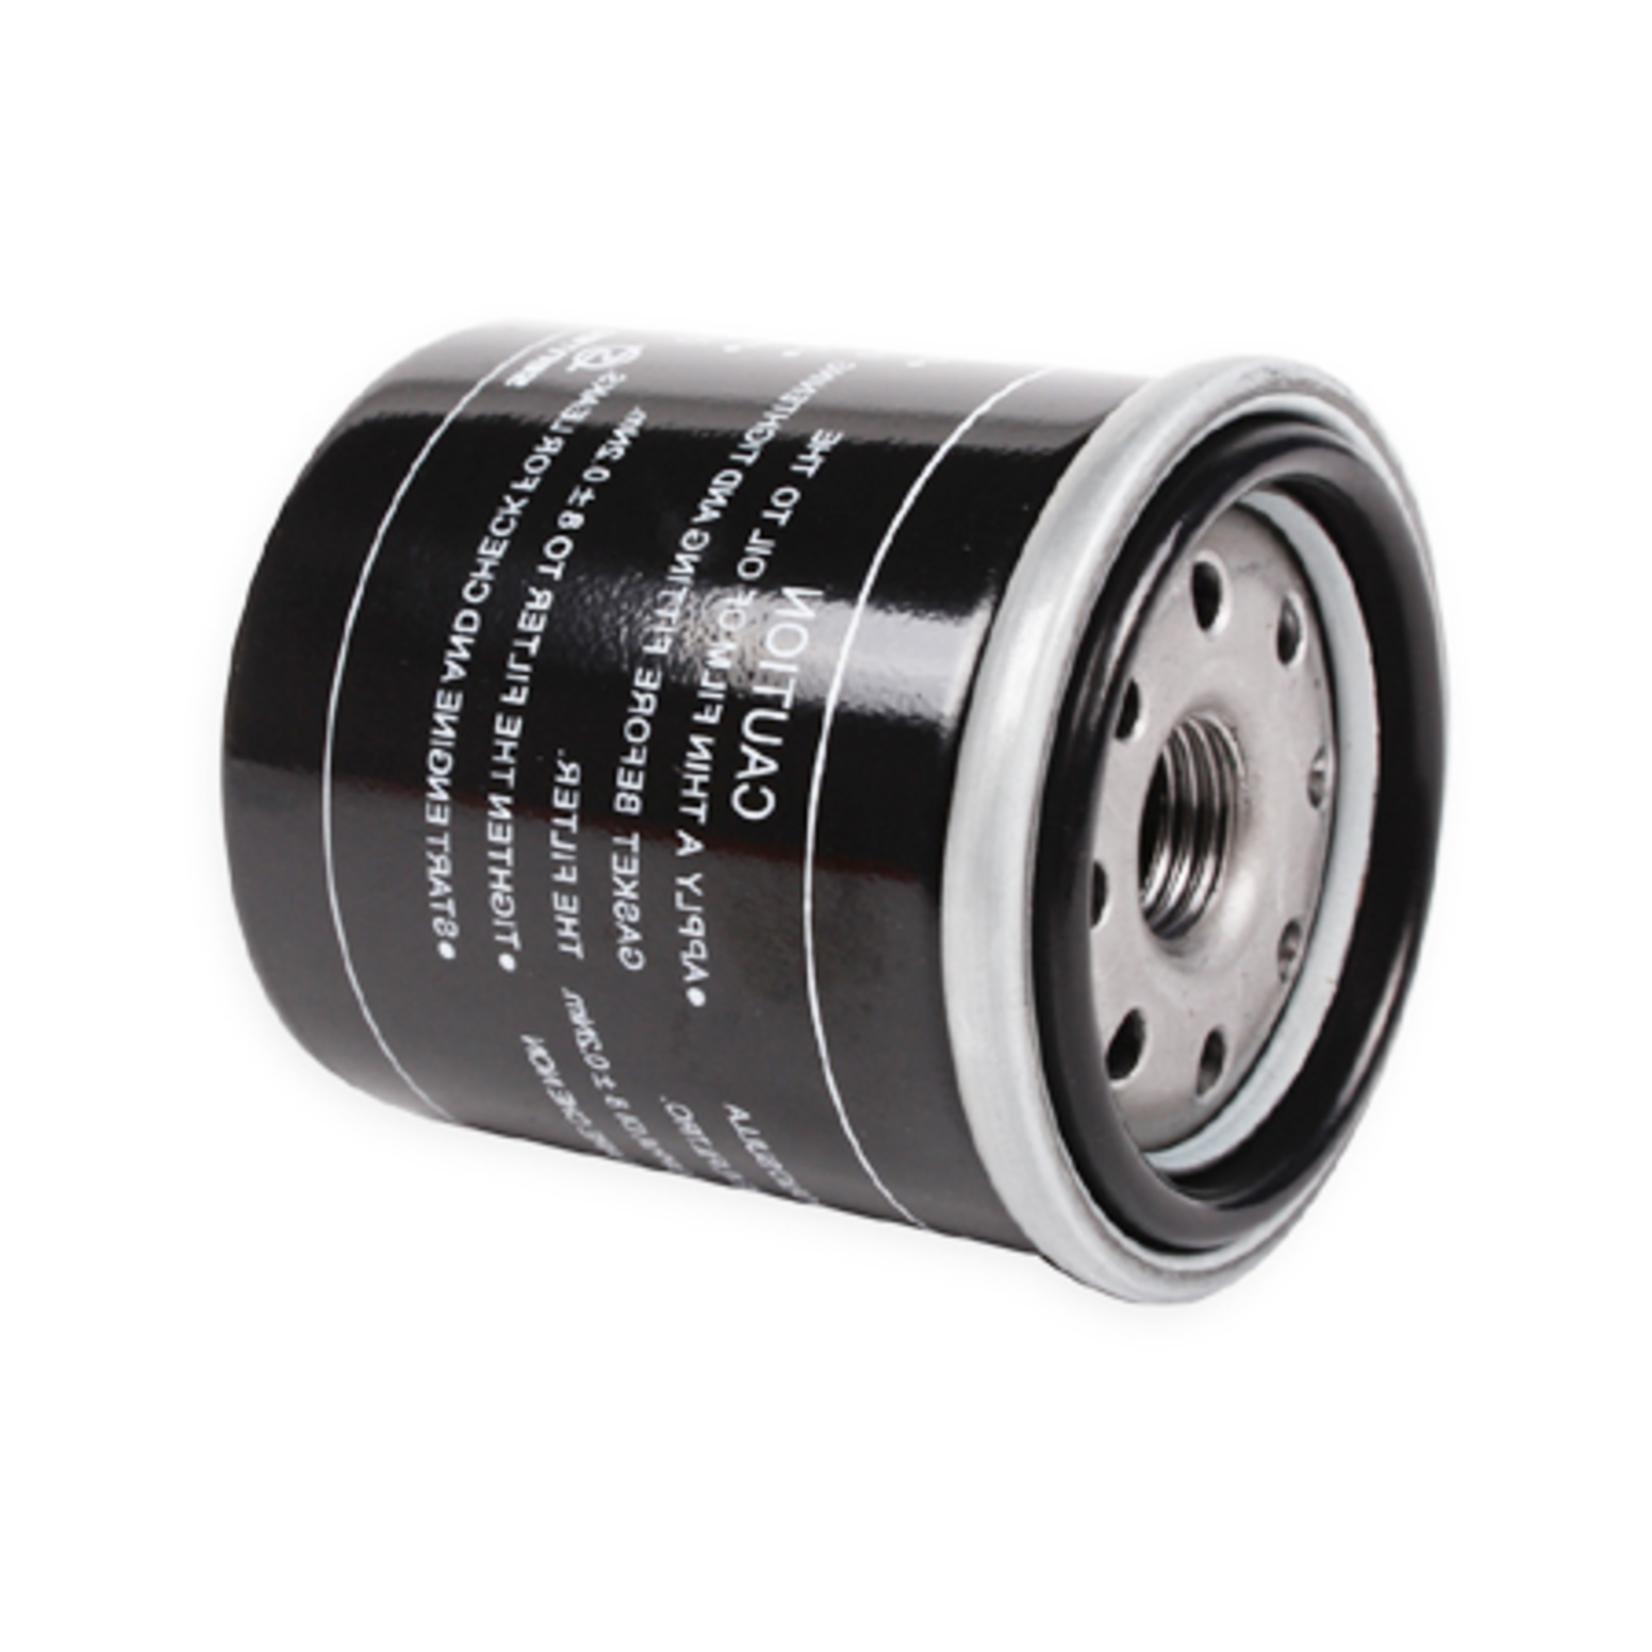 Parts Oil Filter, 125-300cc Engine